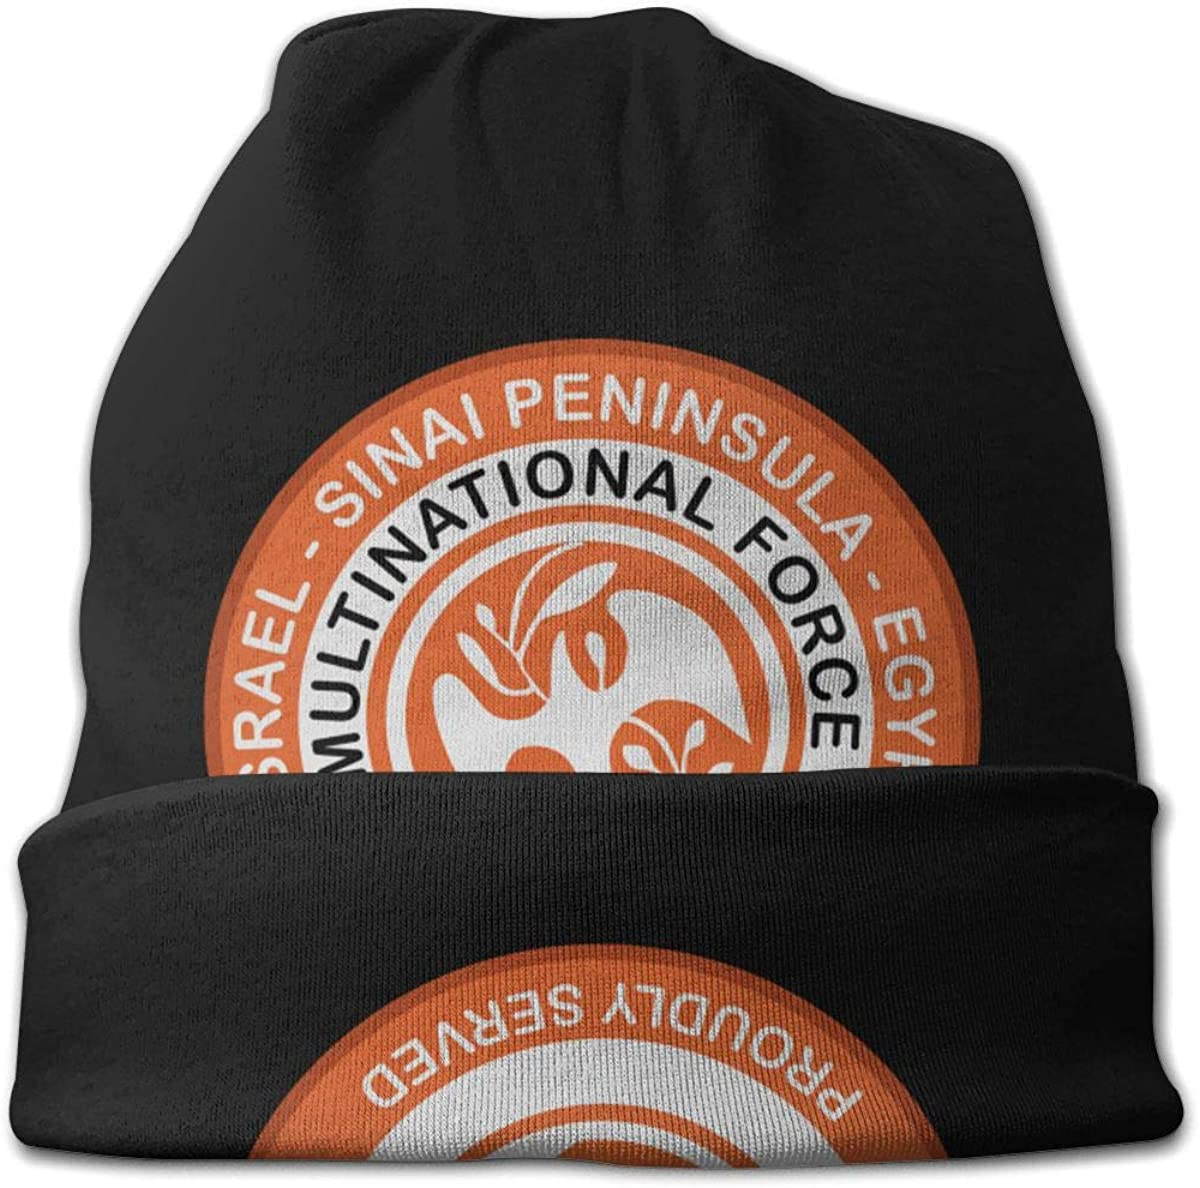 JINGUImao Multinational Force and Observers-MFO Unisex Warm Hat Knit Hat Skull Cap Beanies Cap